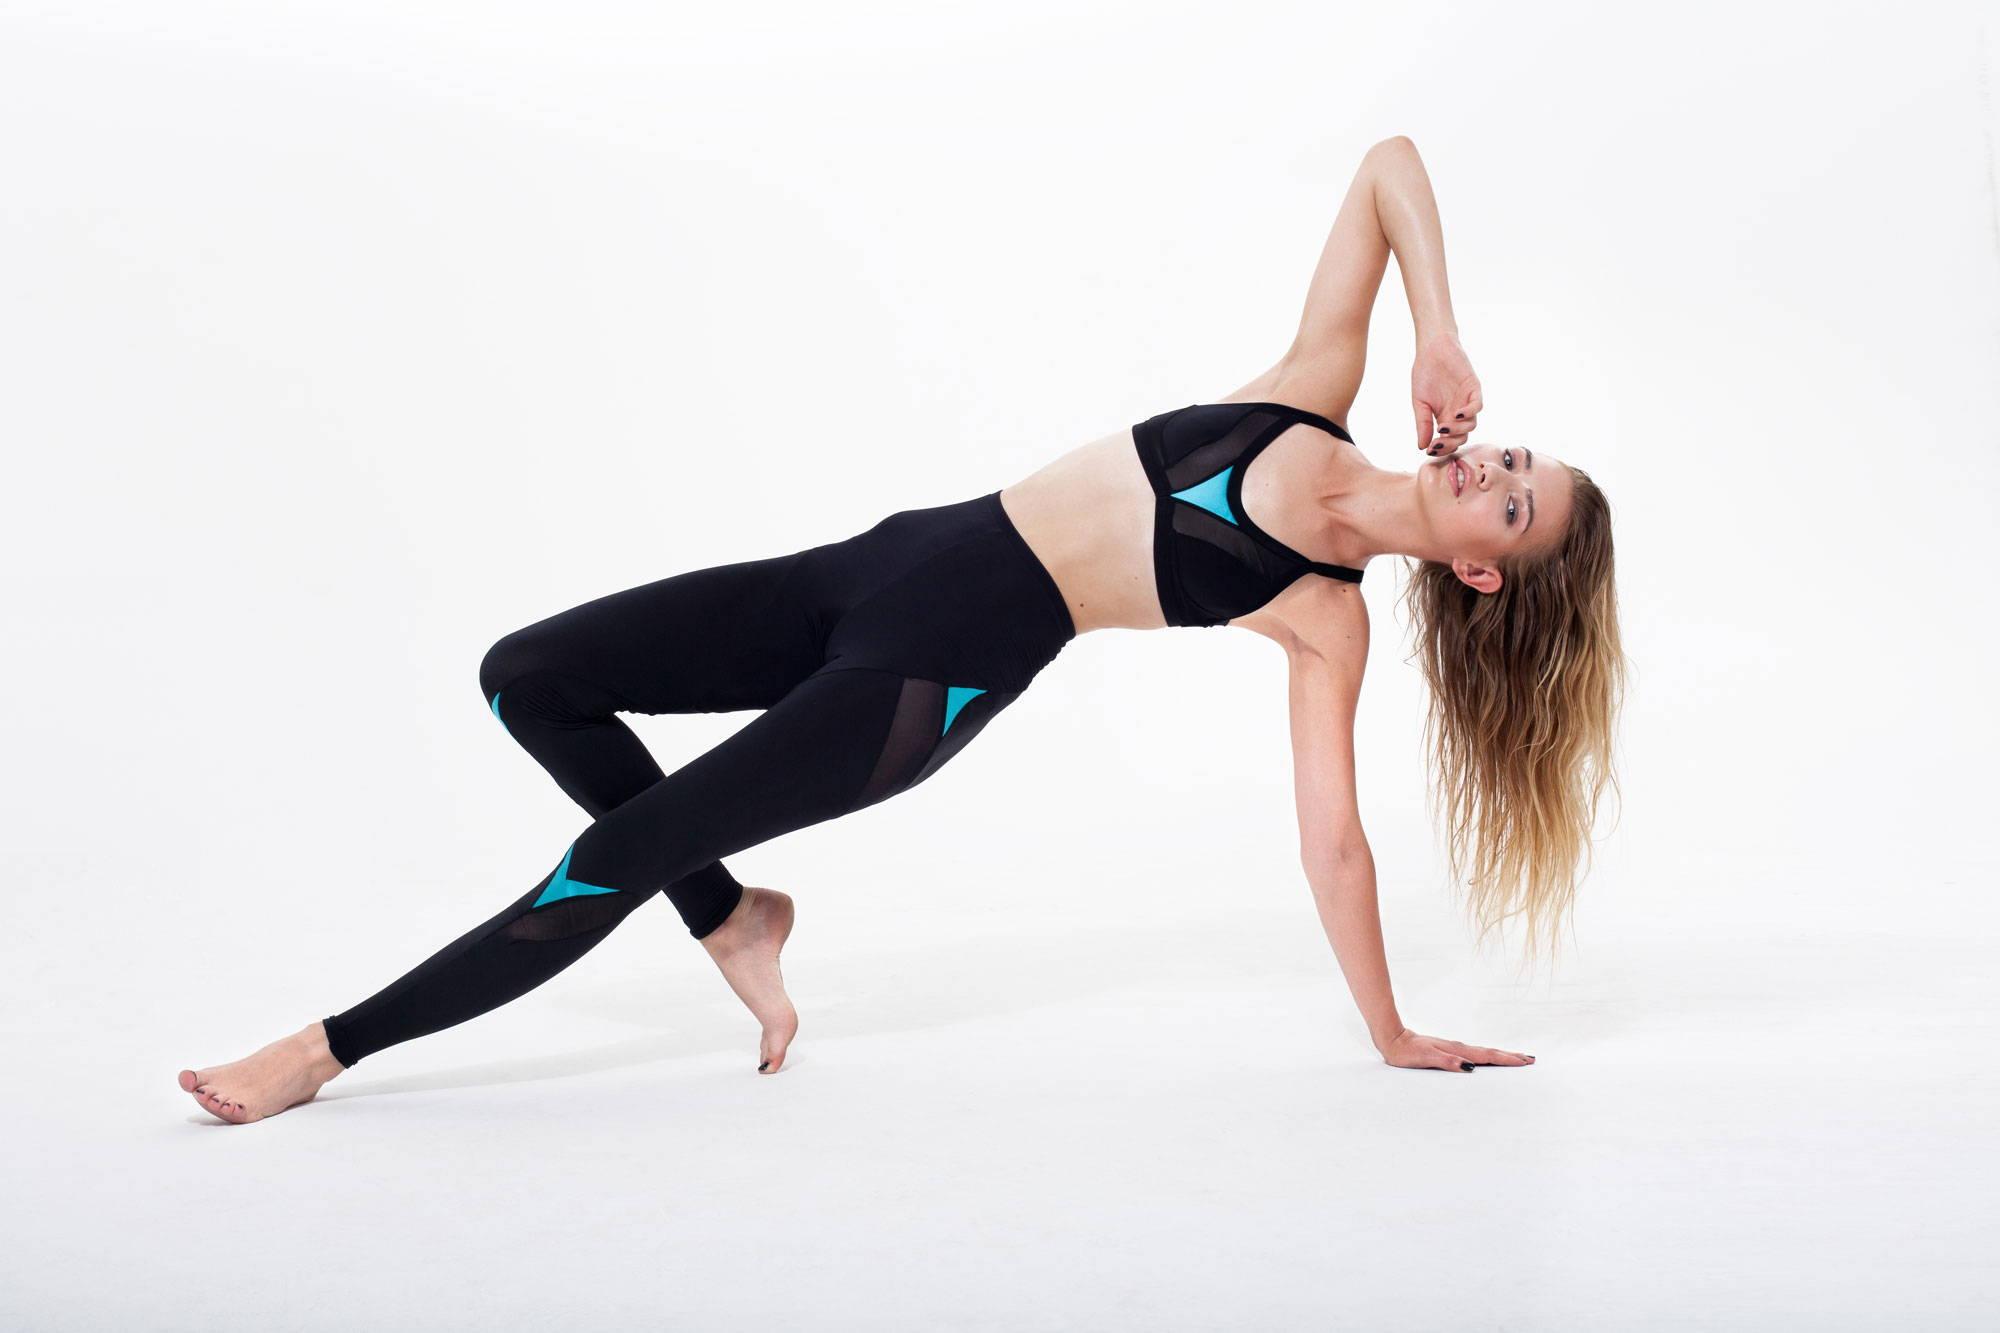 gymnastik outfit und bodywear